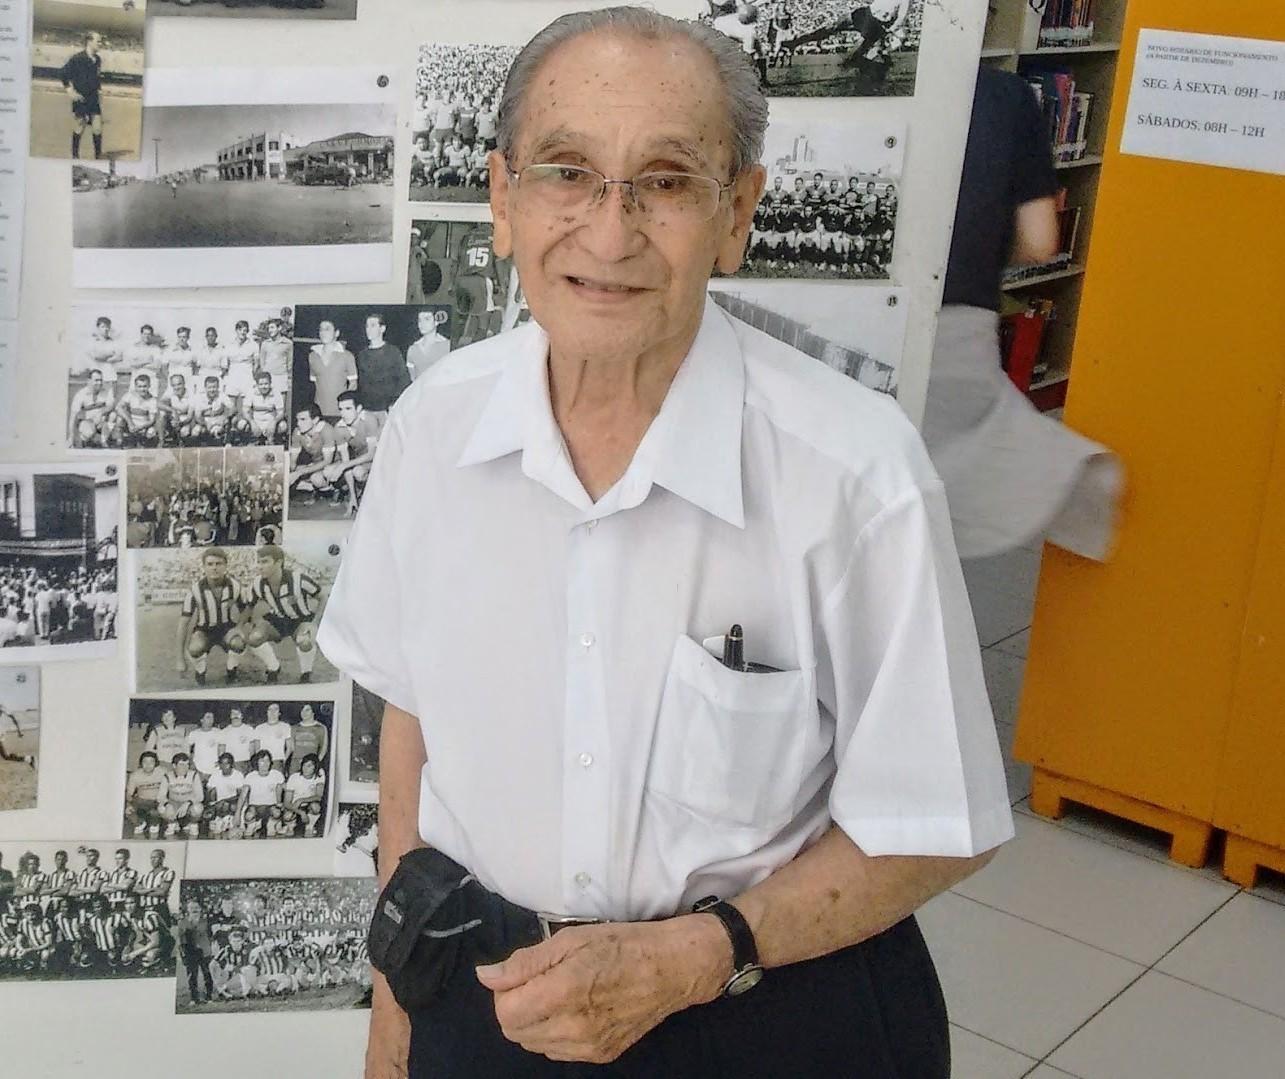 Morre Kenji Ueta aos 93 anos